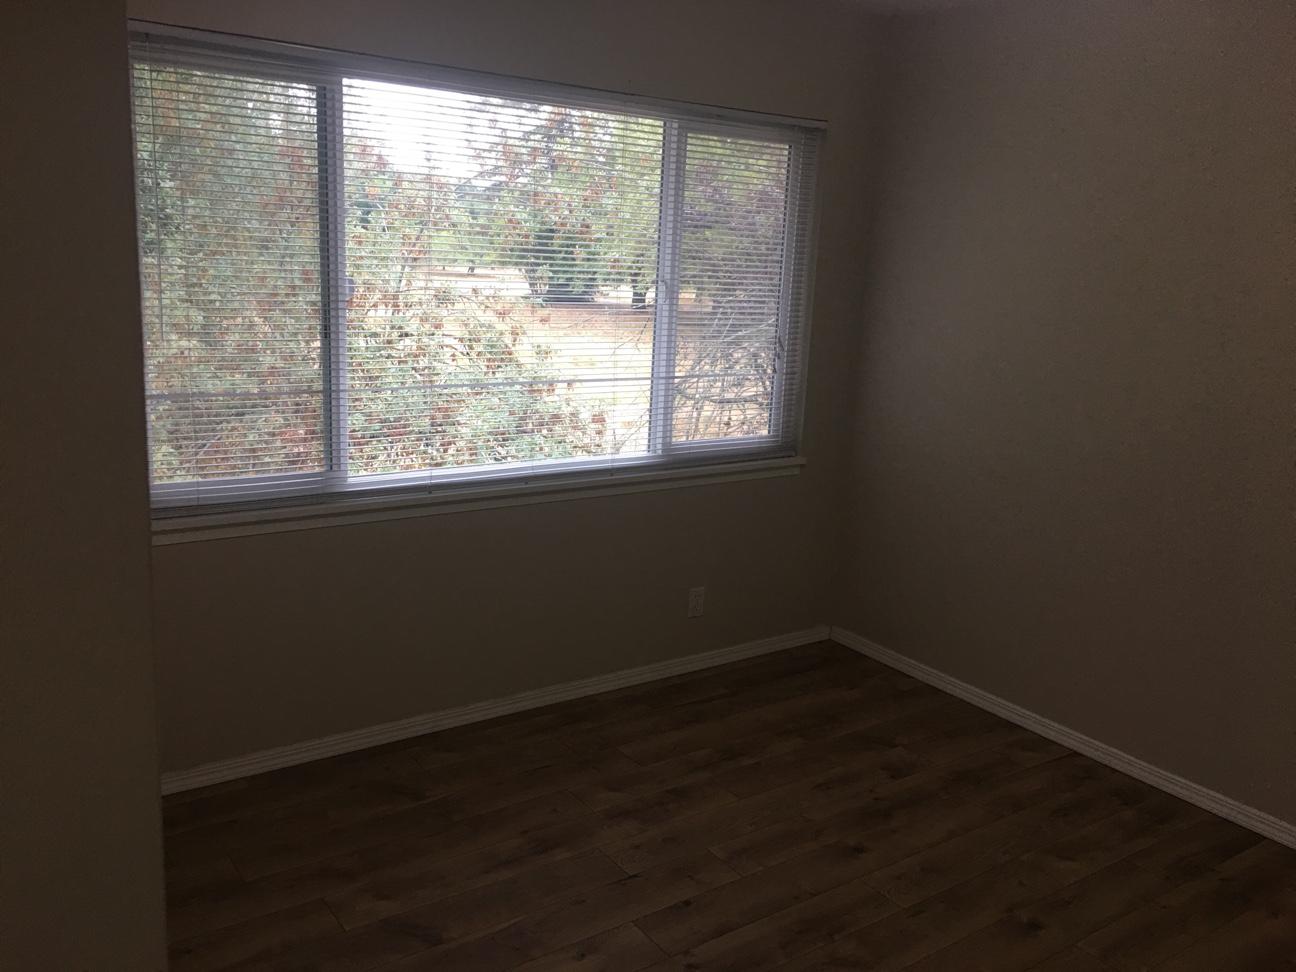 3820 Sumner Lane,Santa Rosa,California,United States 95405,1 Bedroom Bedrooms,1 BathroomBathrooms,Apartment,Sumner Lane,1689